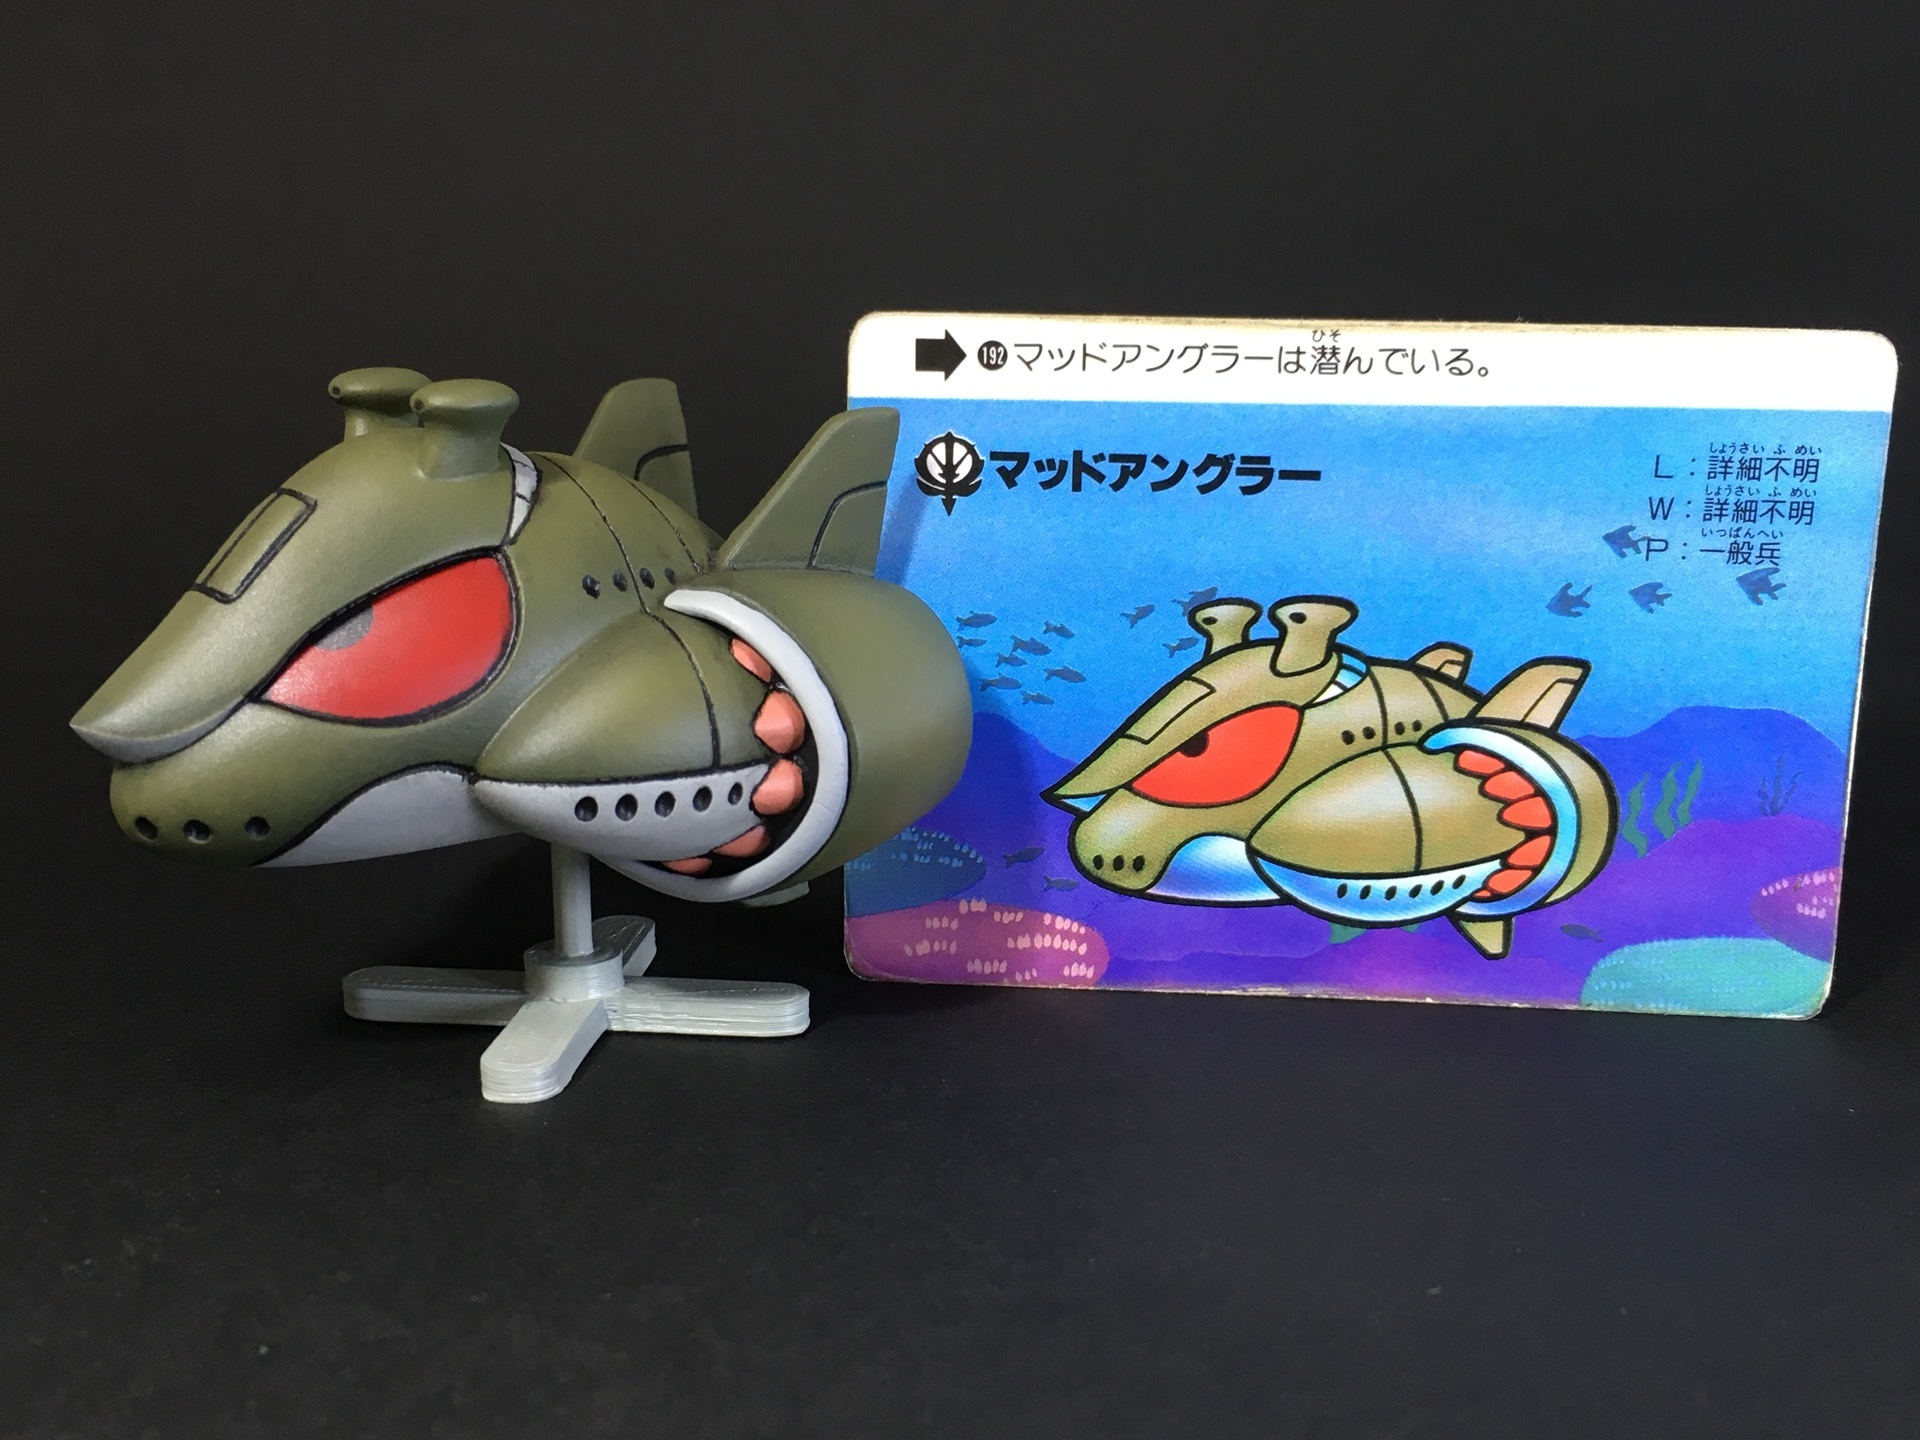 SDマッドアングラー カードダス.JPG